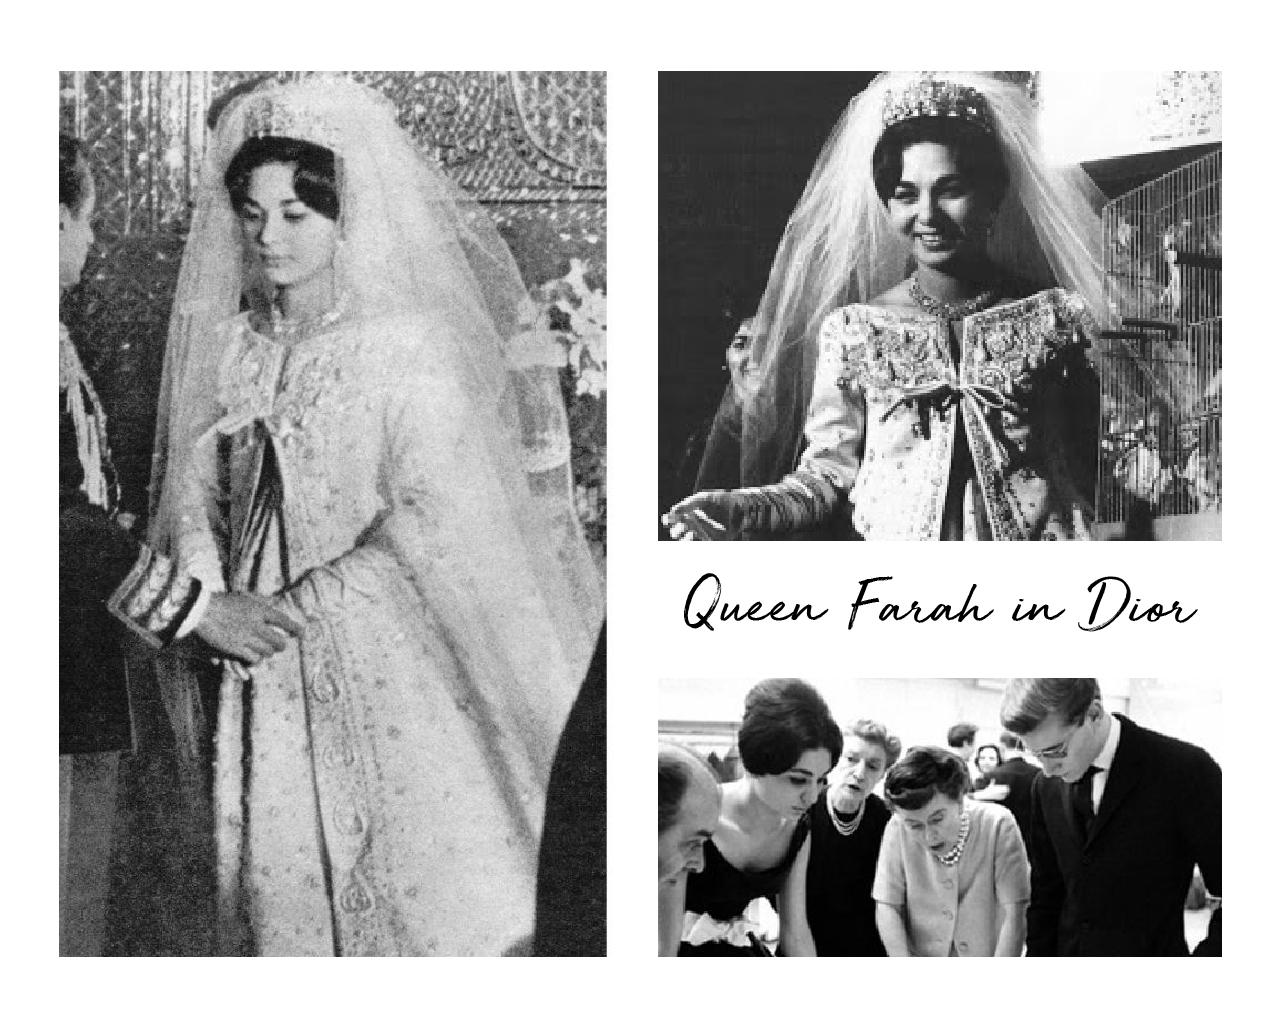 Farah Pahlavi in Dior.